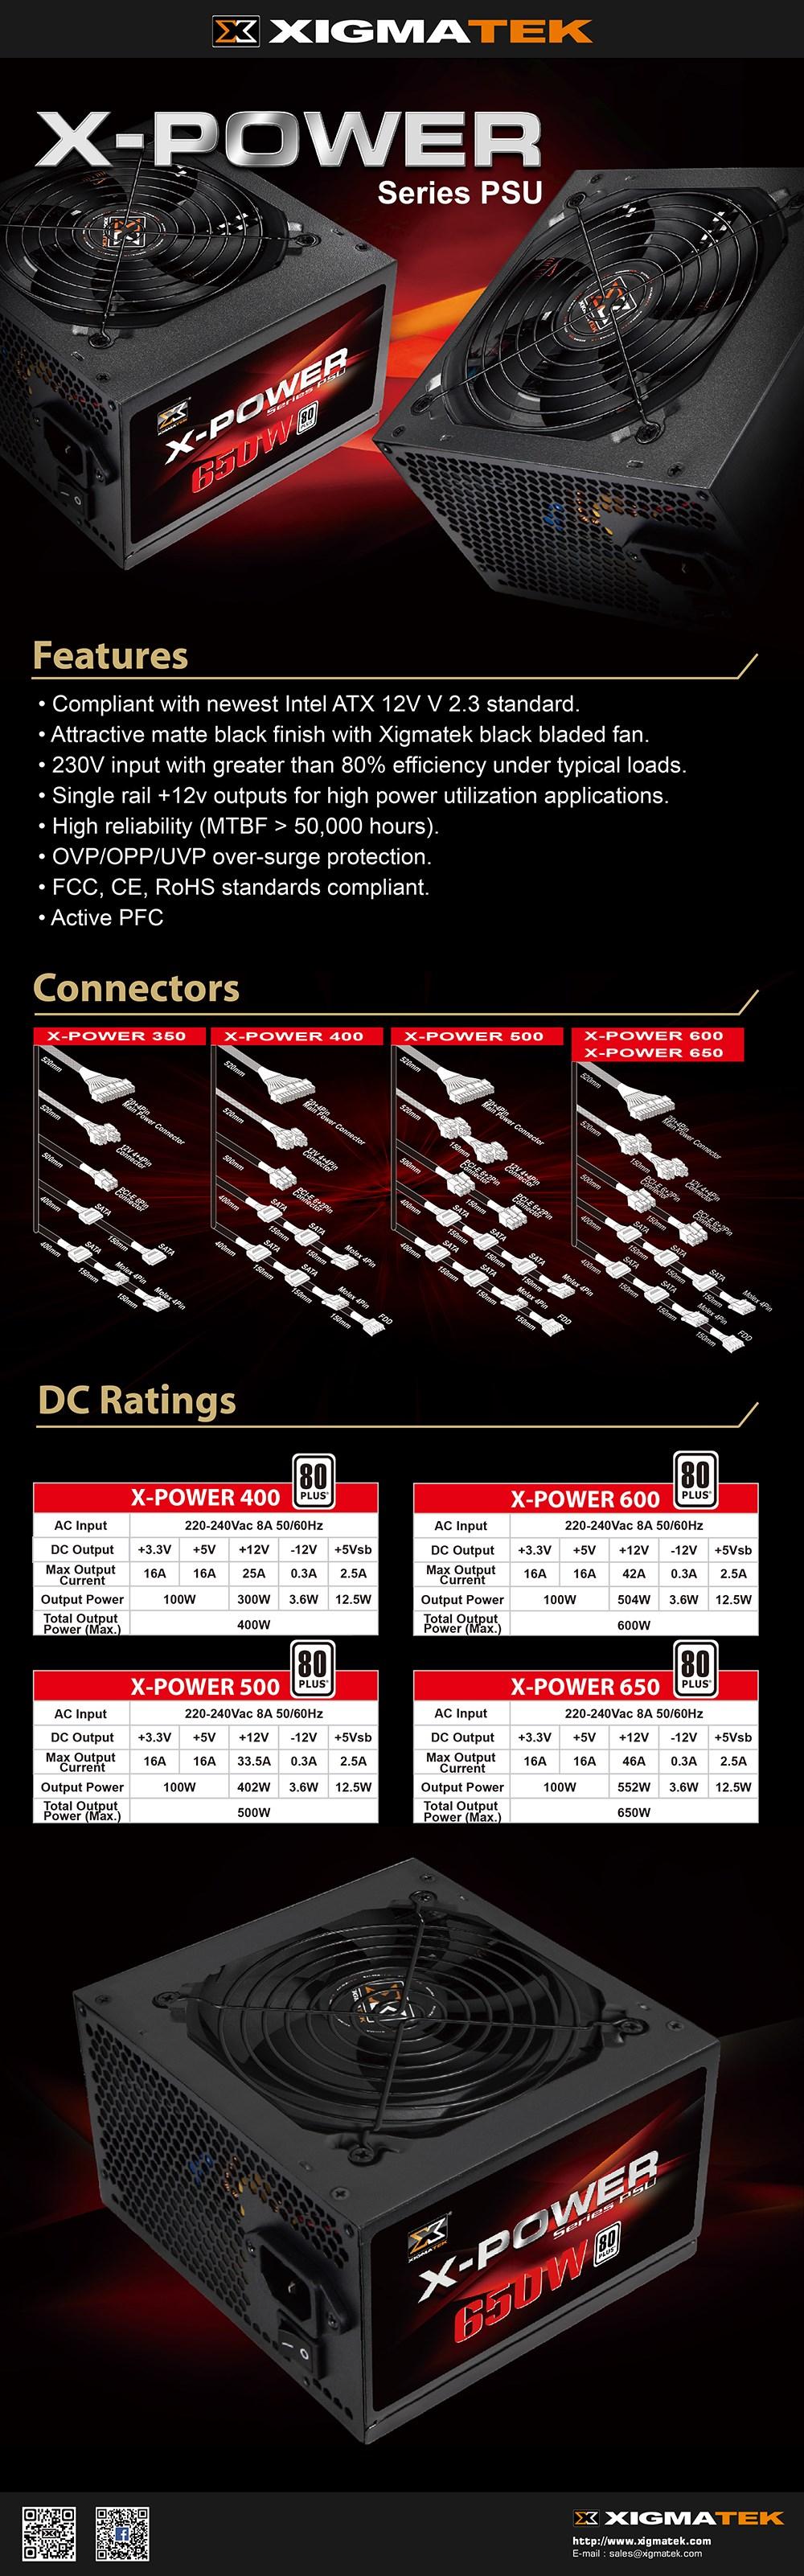 Xigmatek X-Power 700W 80+ Non-Modular Power Supply - Overview 1